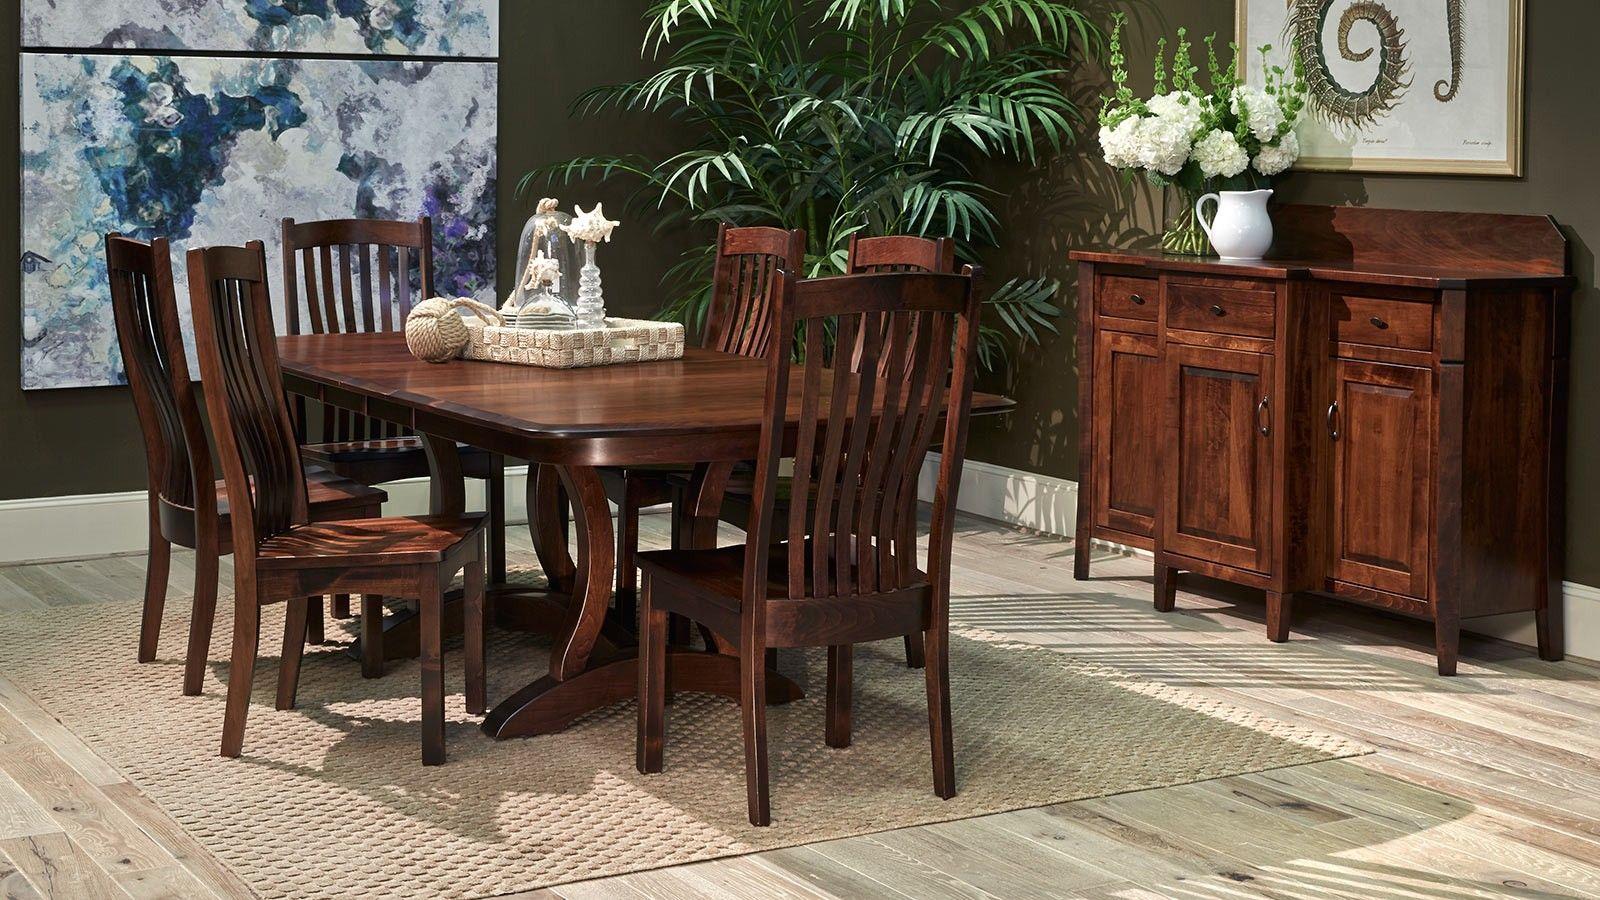 Richfield Brown Maple Dining Room  Gf Design A Room Contest 2016 Fascinating Maple Dining Room Table Design Ideas